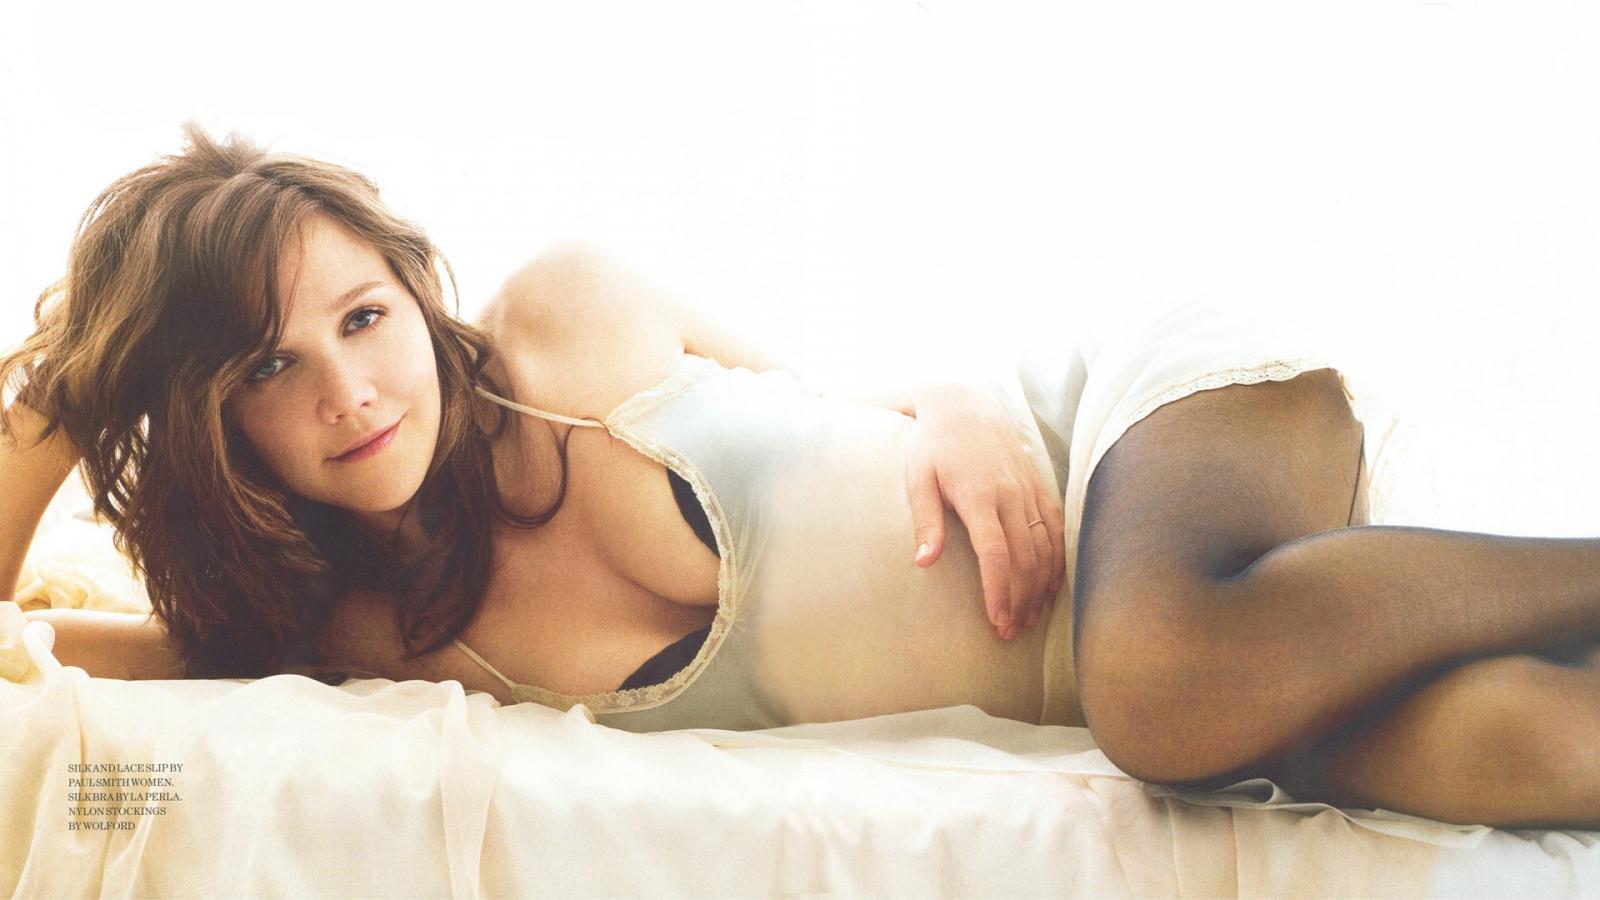 Maggie Gyllenhaal Wallpapers